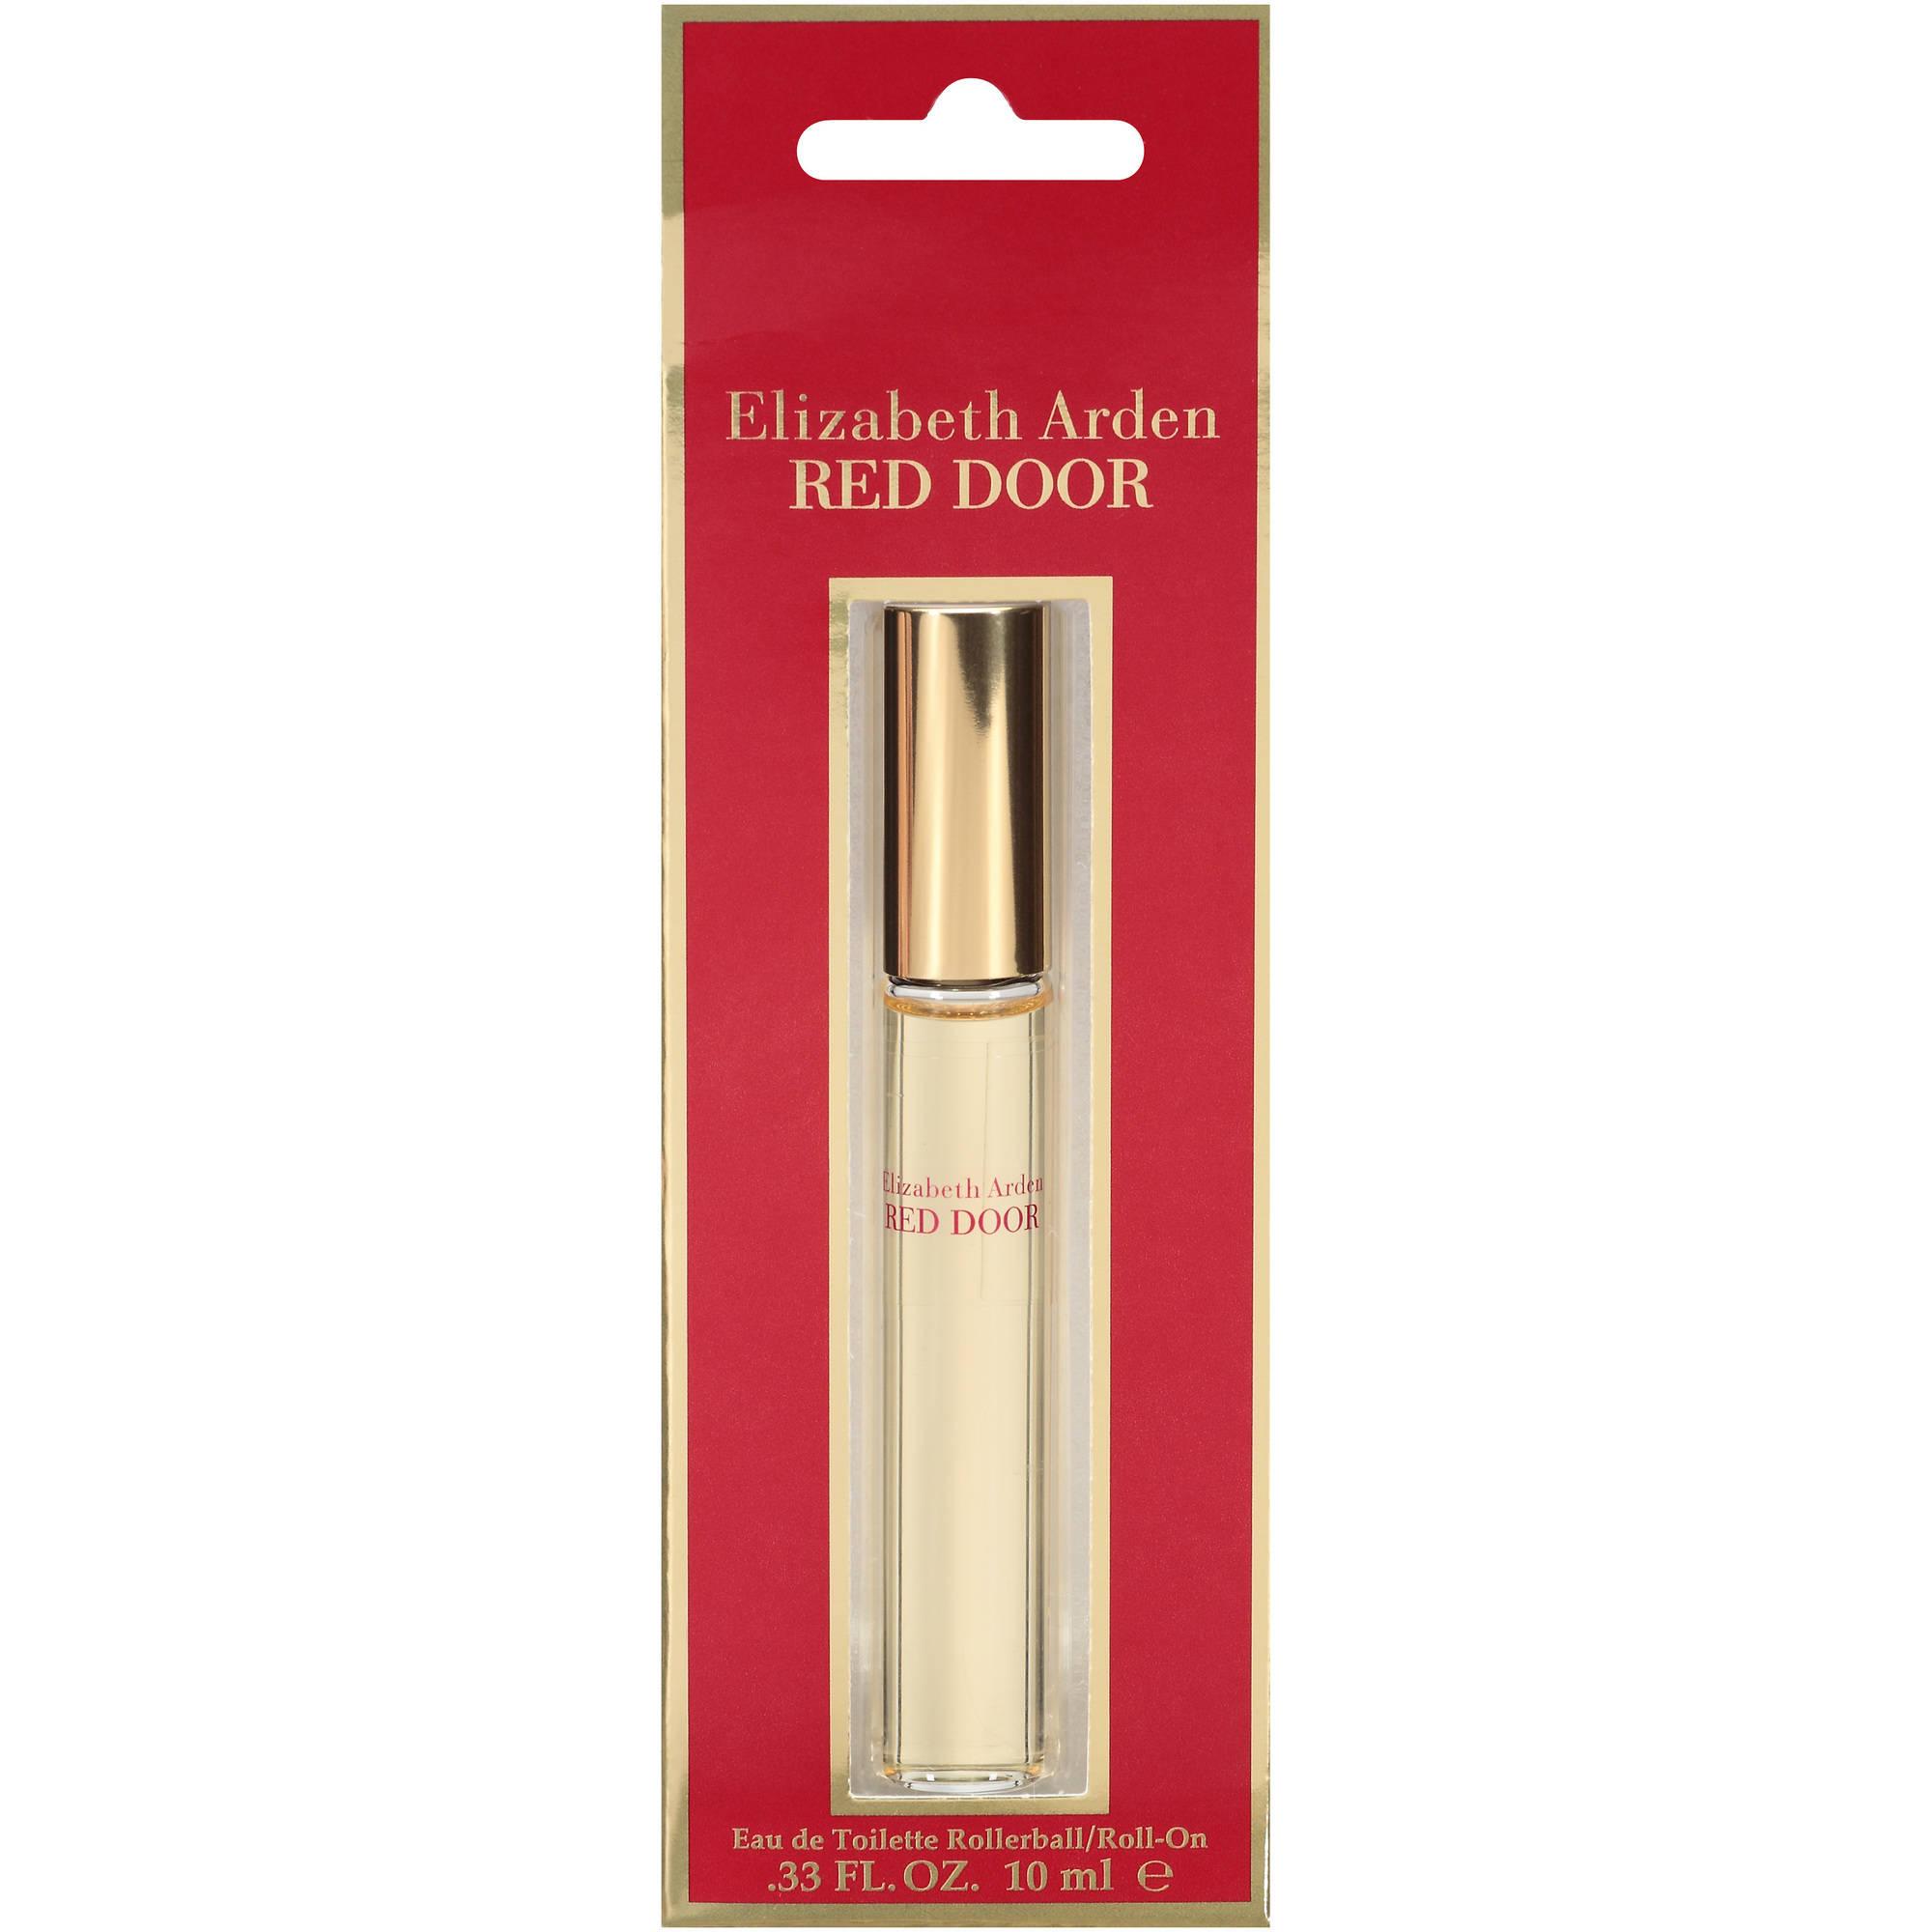 Elizabeth Arden Perfume Walmart